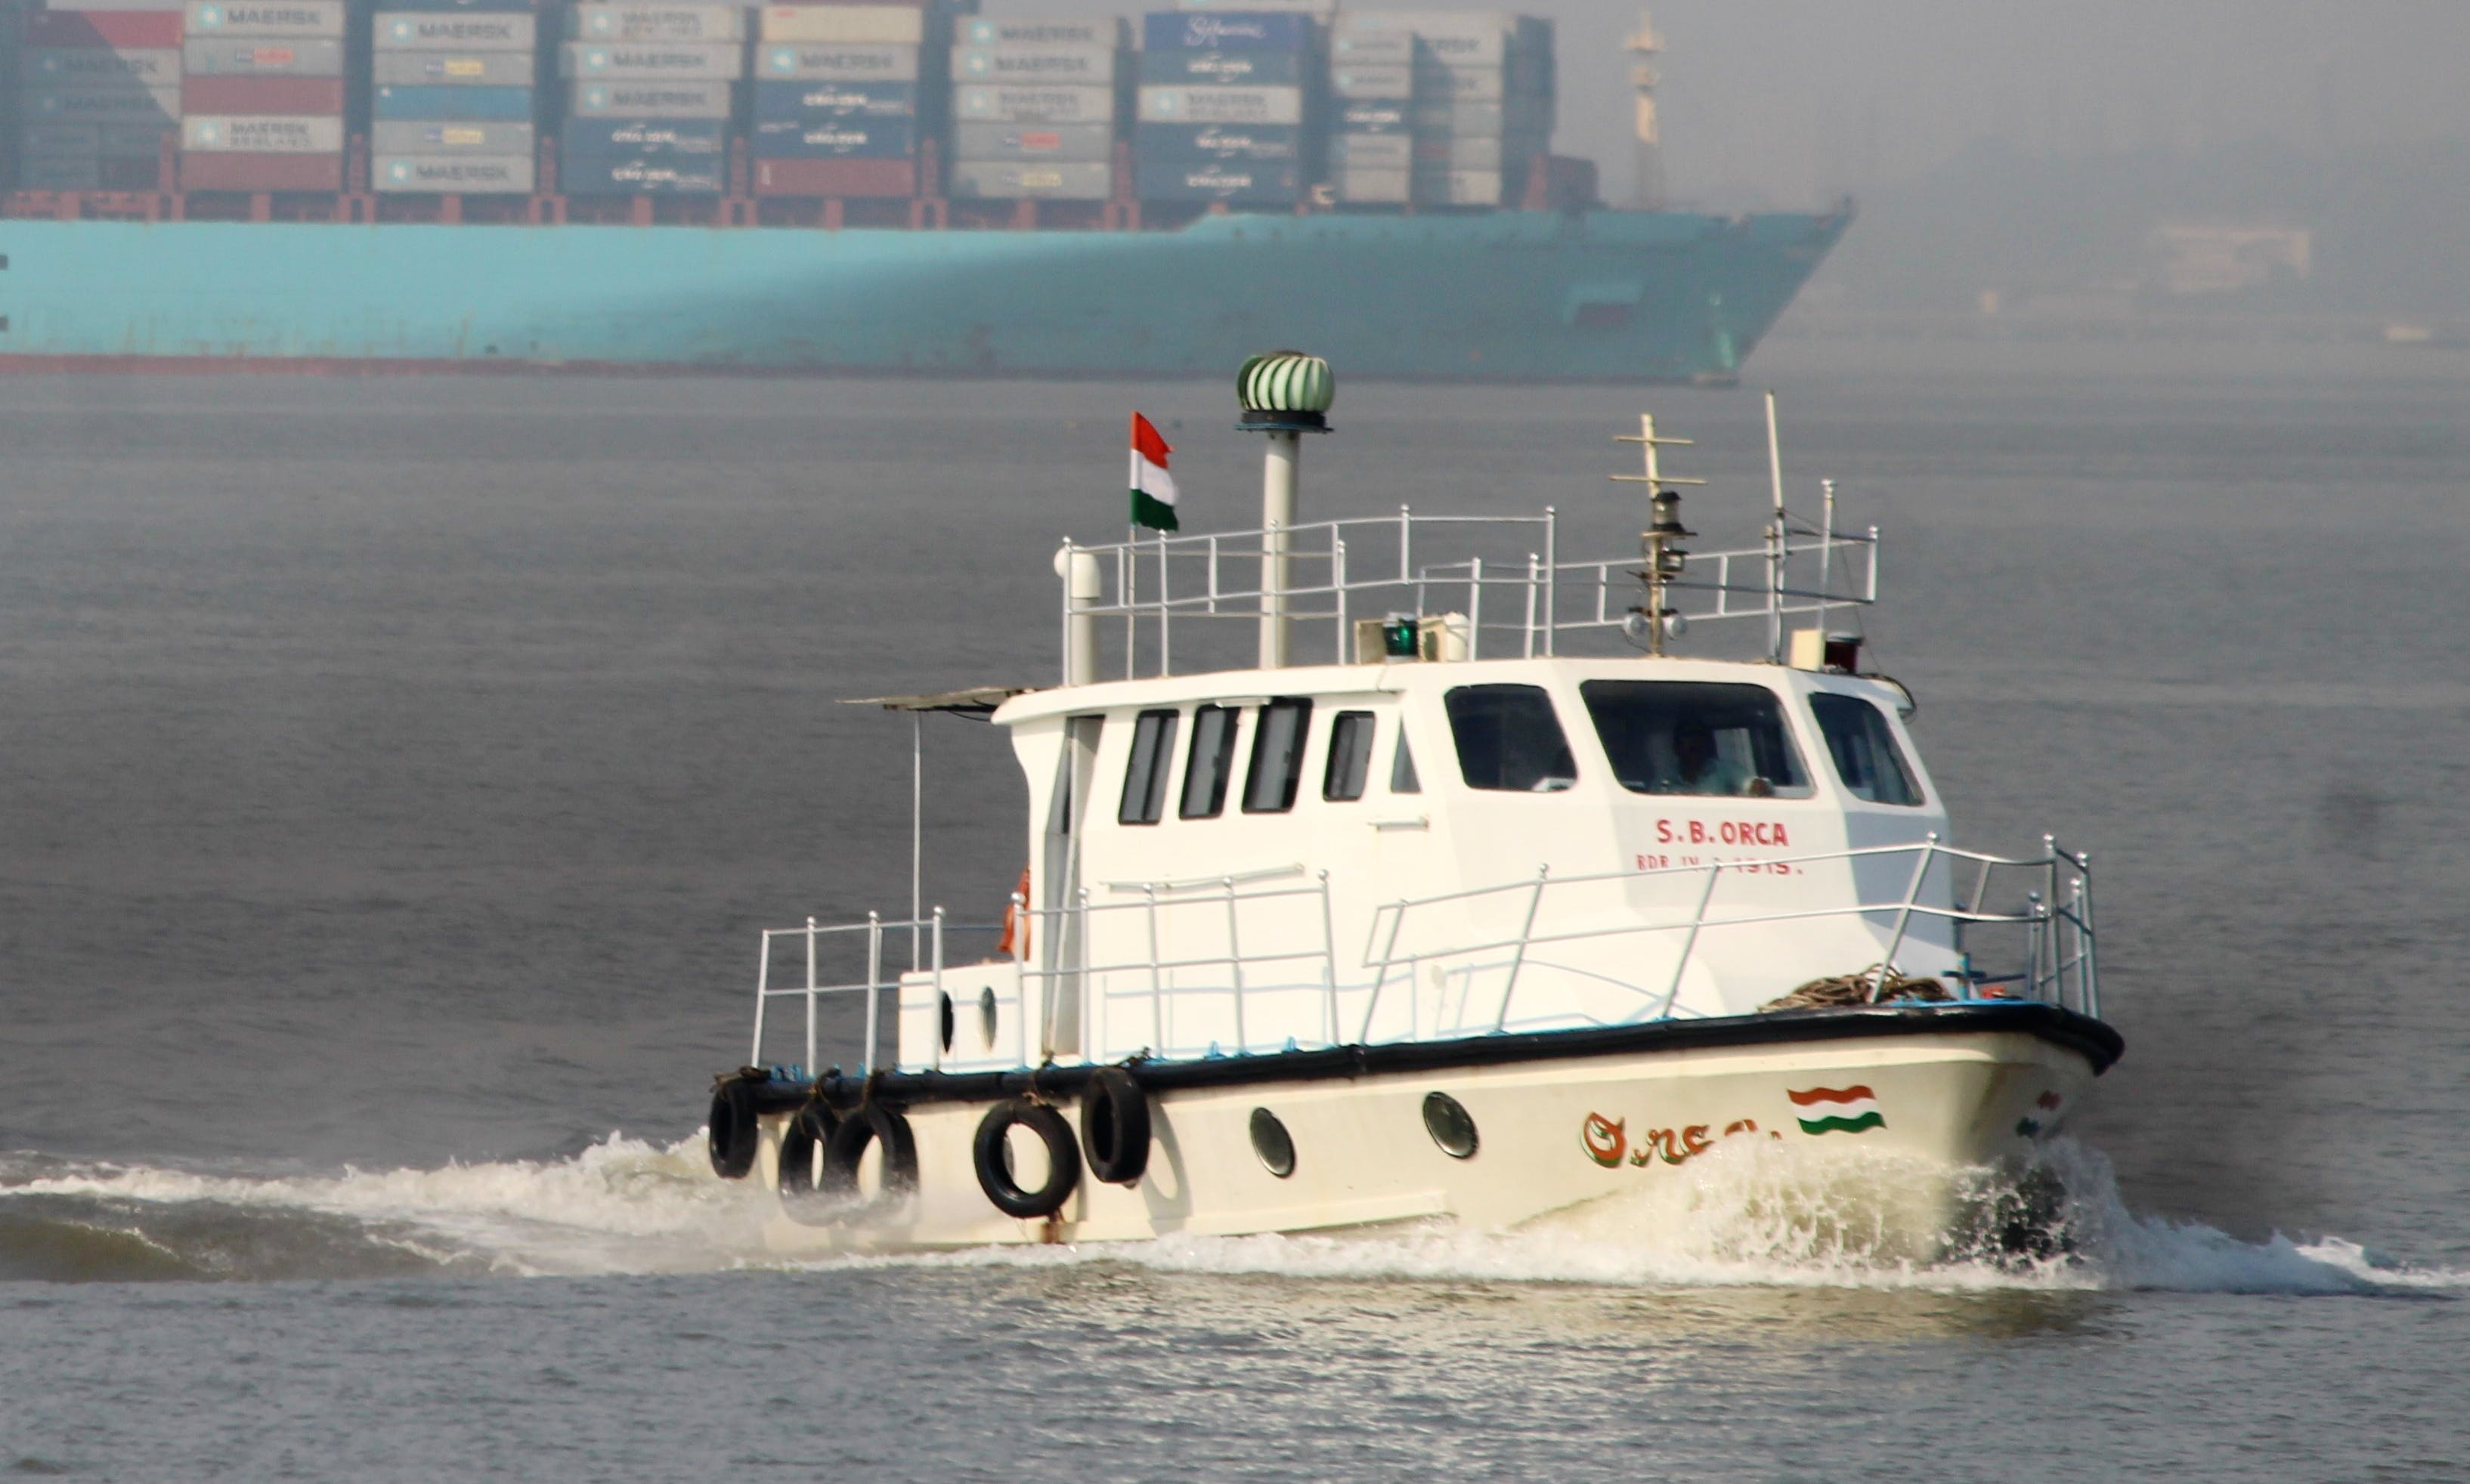 Motor Yacht rental in Navi Mumbai